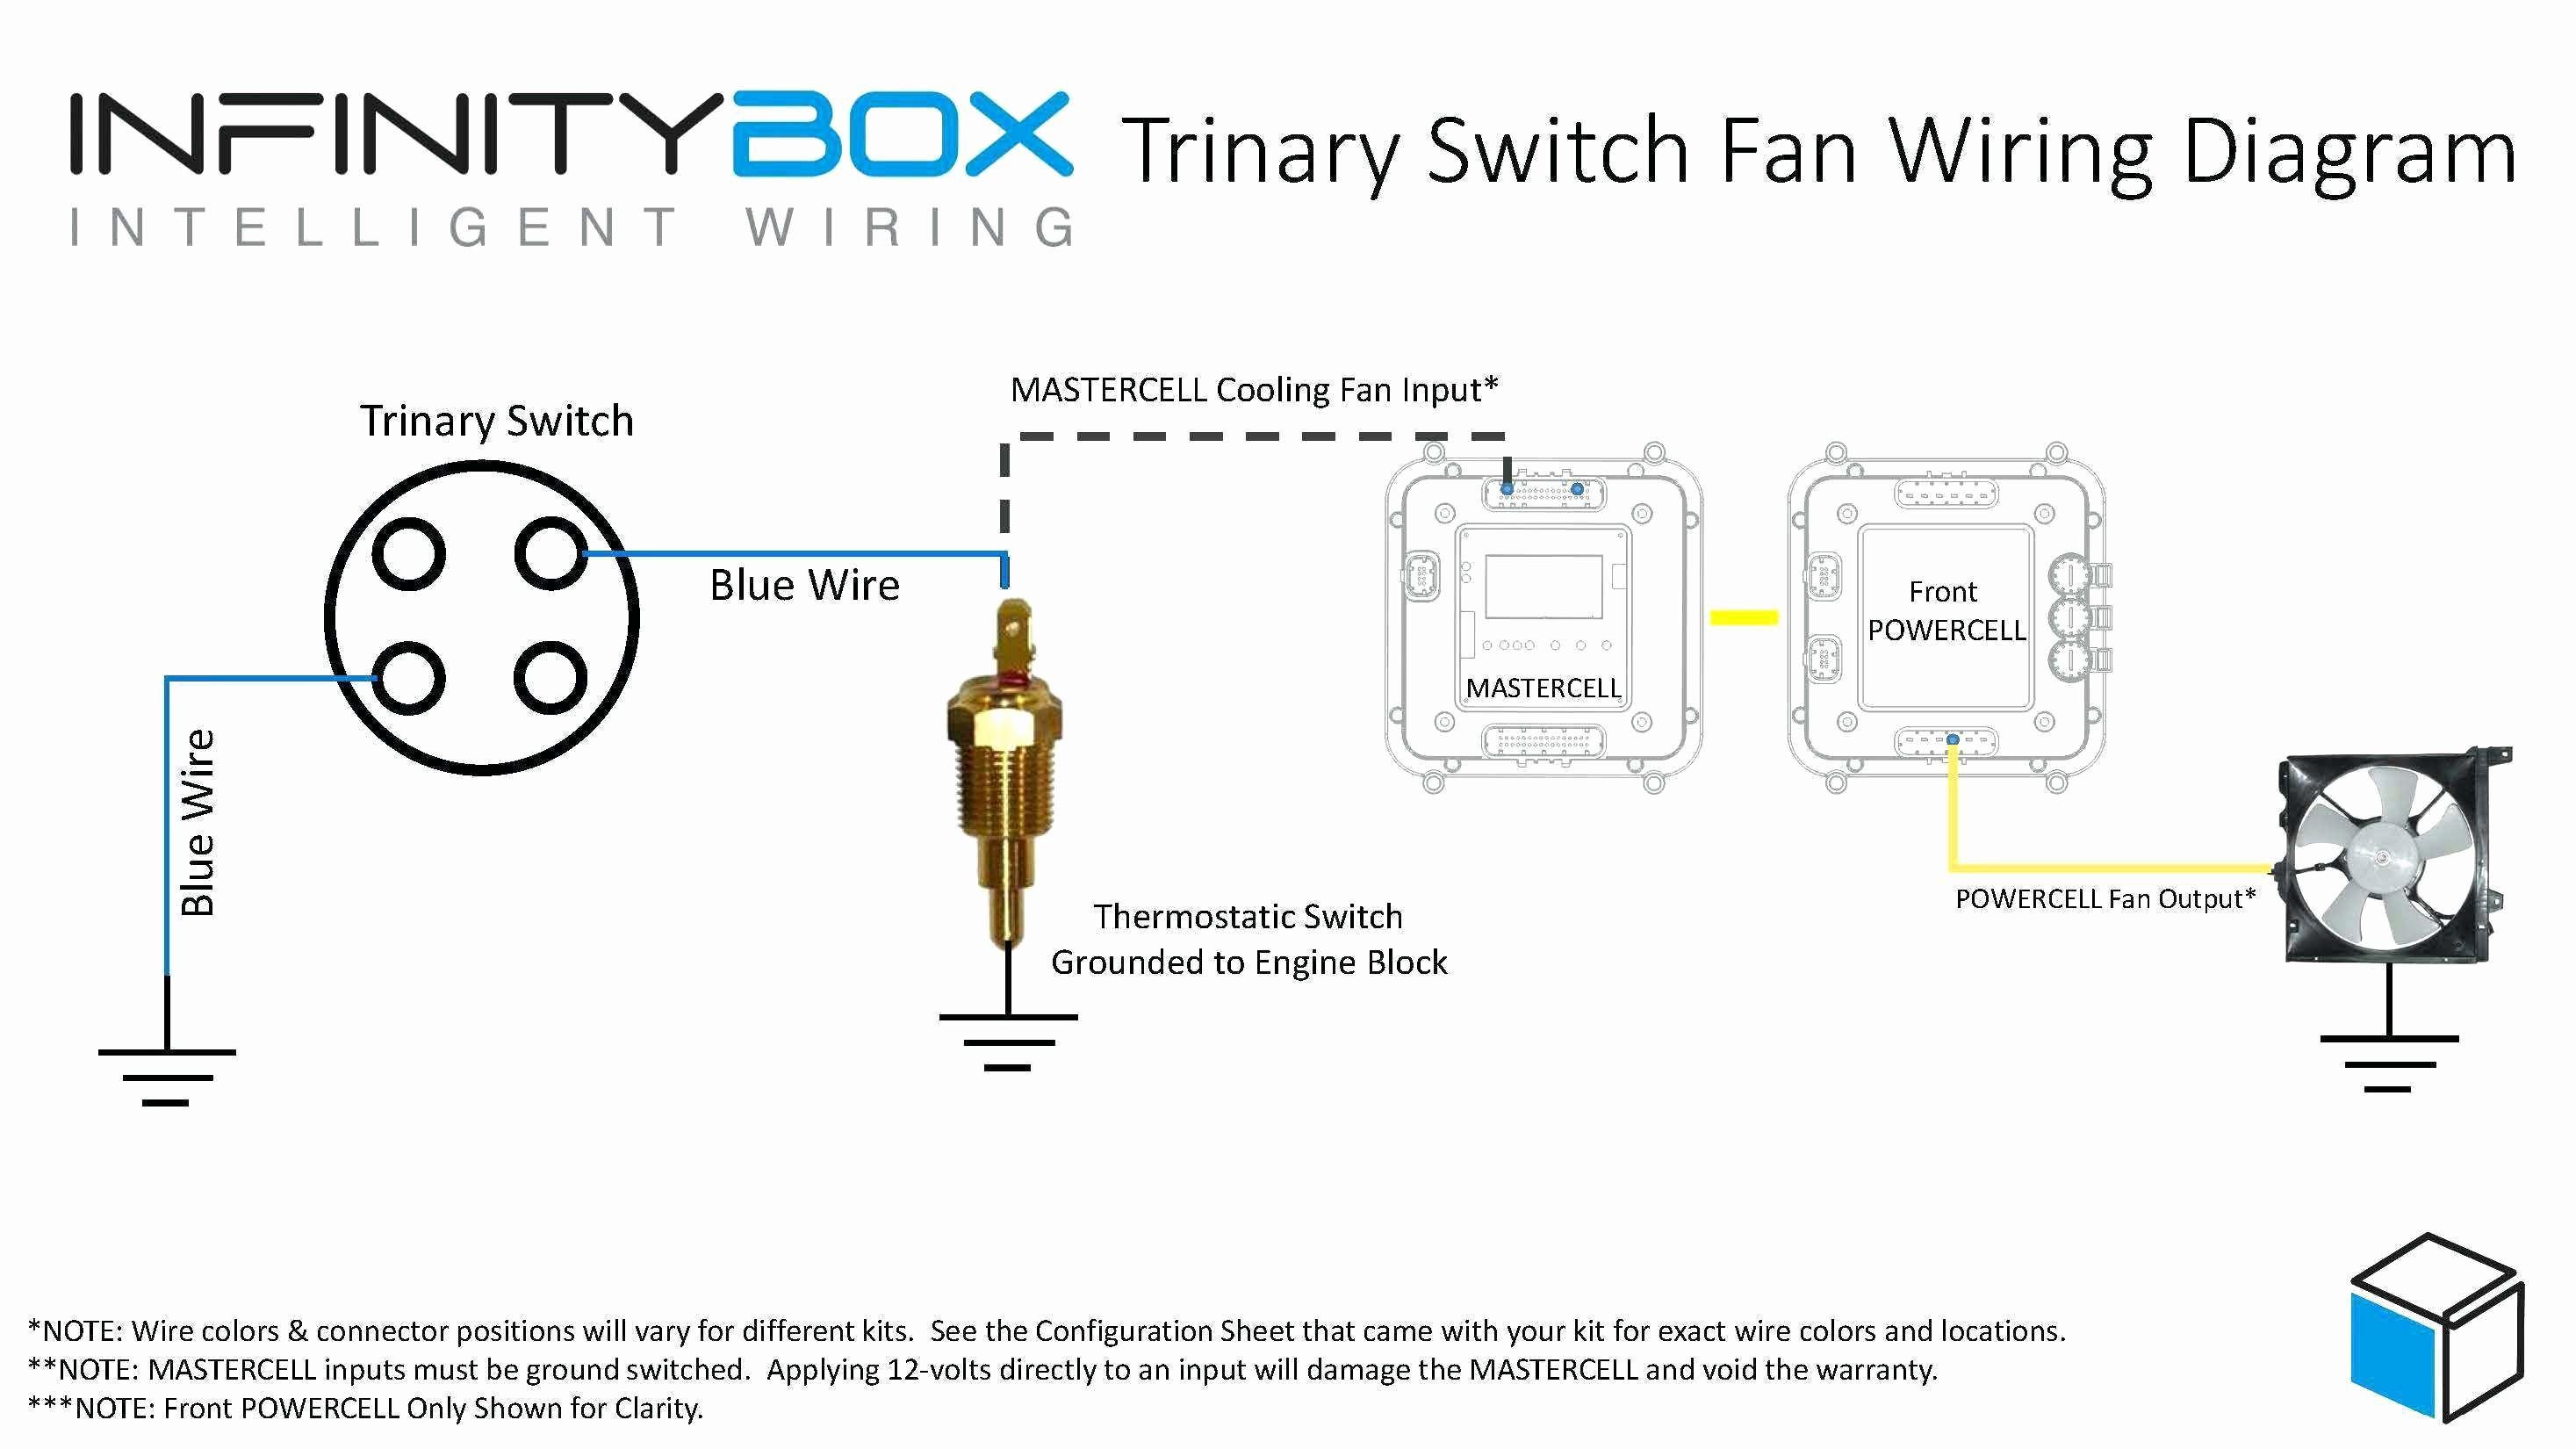 30 Amp Outlet Wiring Diagram Elegant 20 Amp Twist Lock Plug Wiring - Nema L14-30 Wiring Diagram